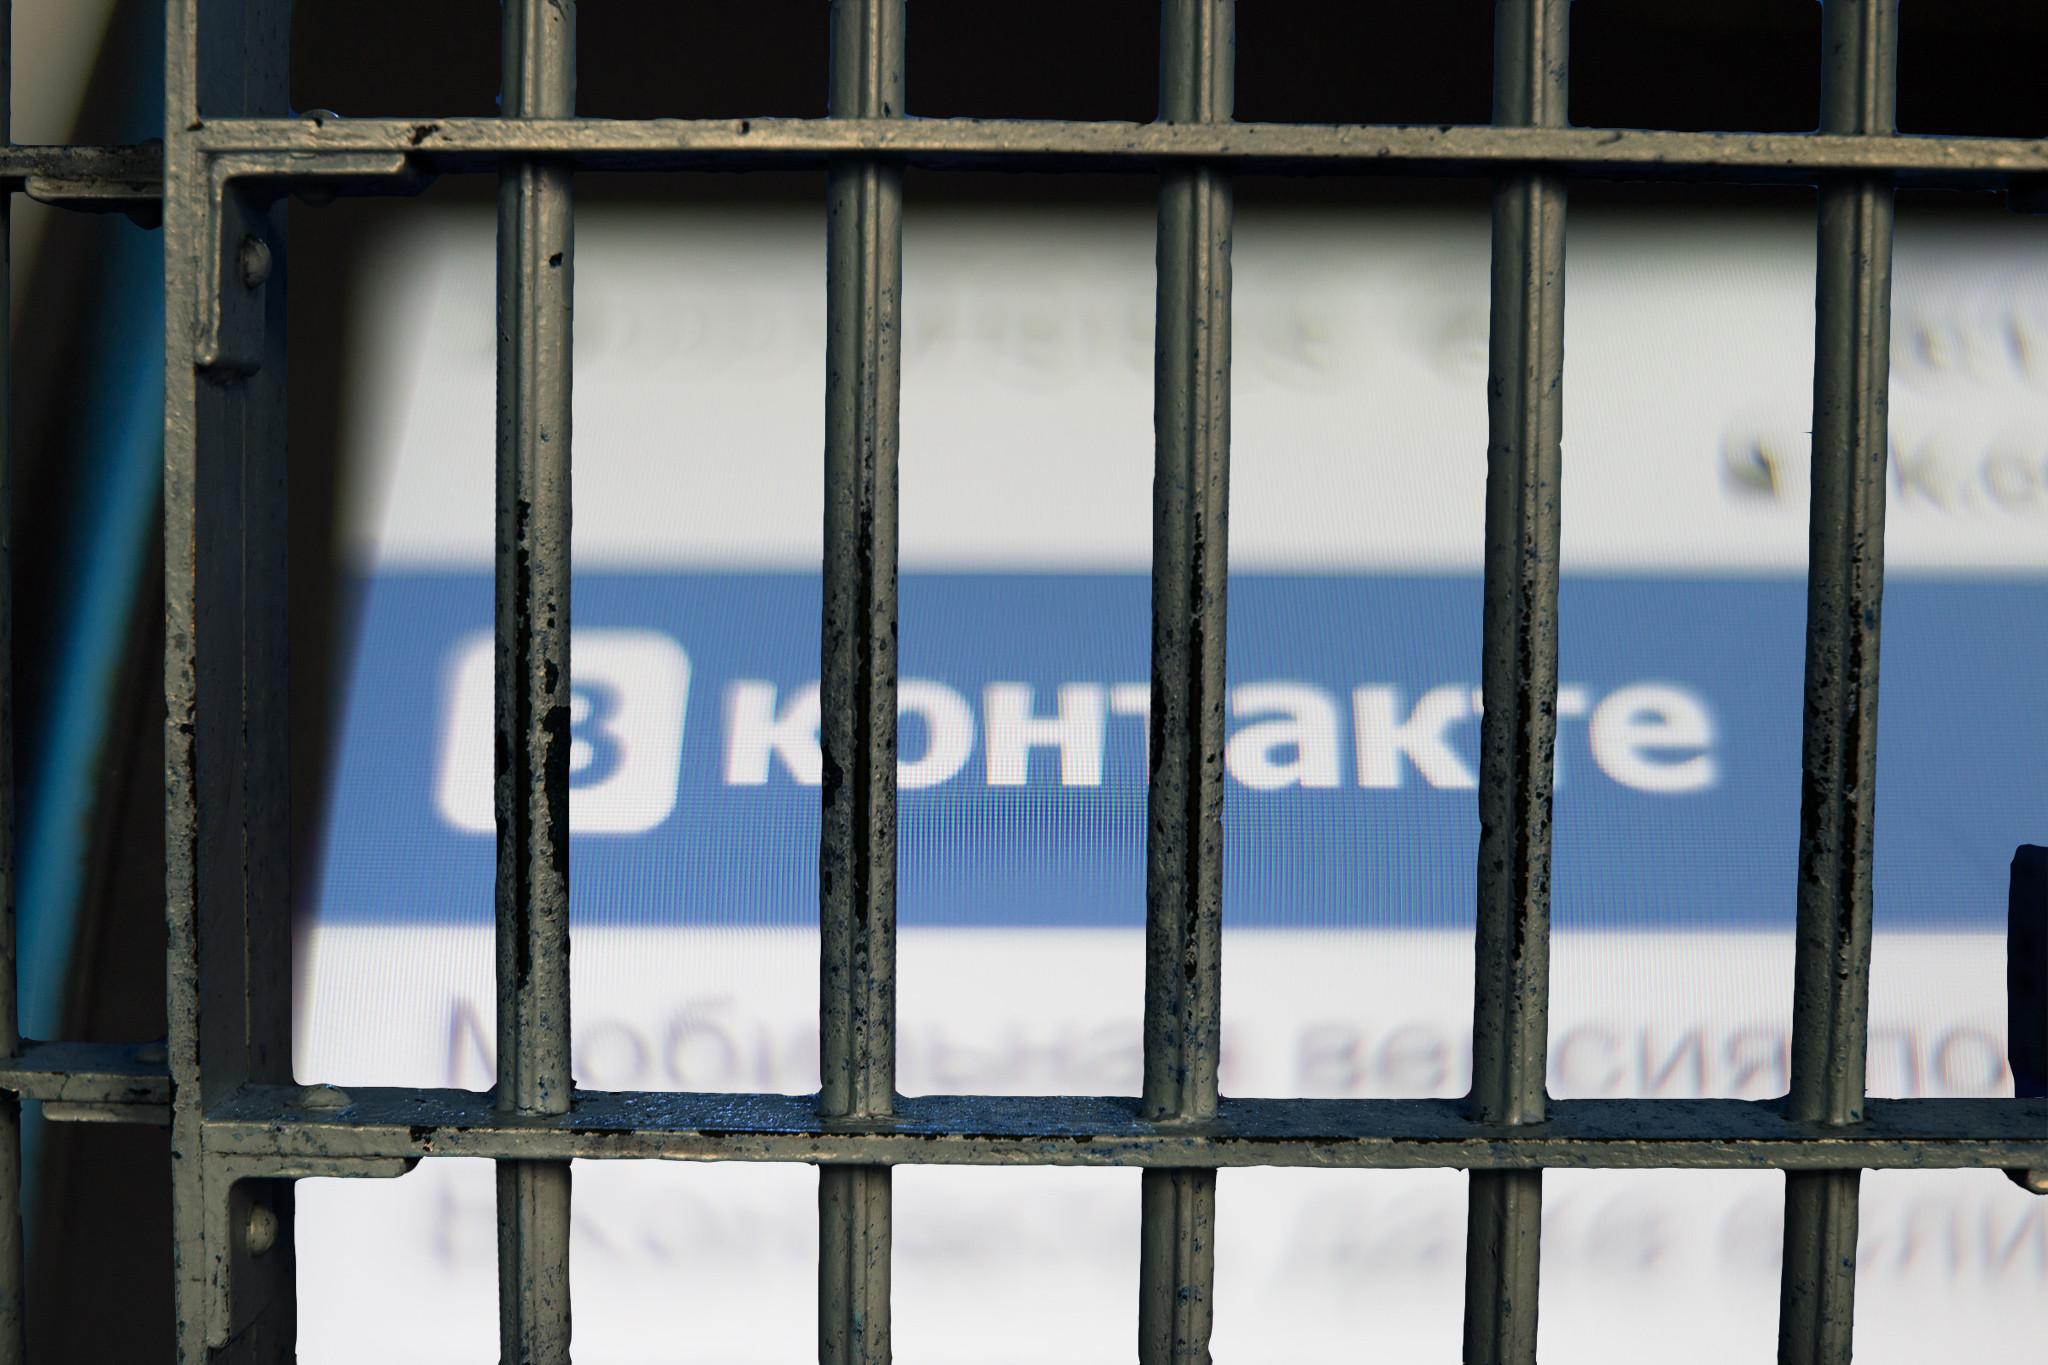 "<p>Фото: &copy;&nbsp;<a href=""https://www.flickr.com/photos/142549771@N05/29161826214/"" target=""_blank"">flickr.com/vazovsky</a></p>"